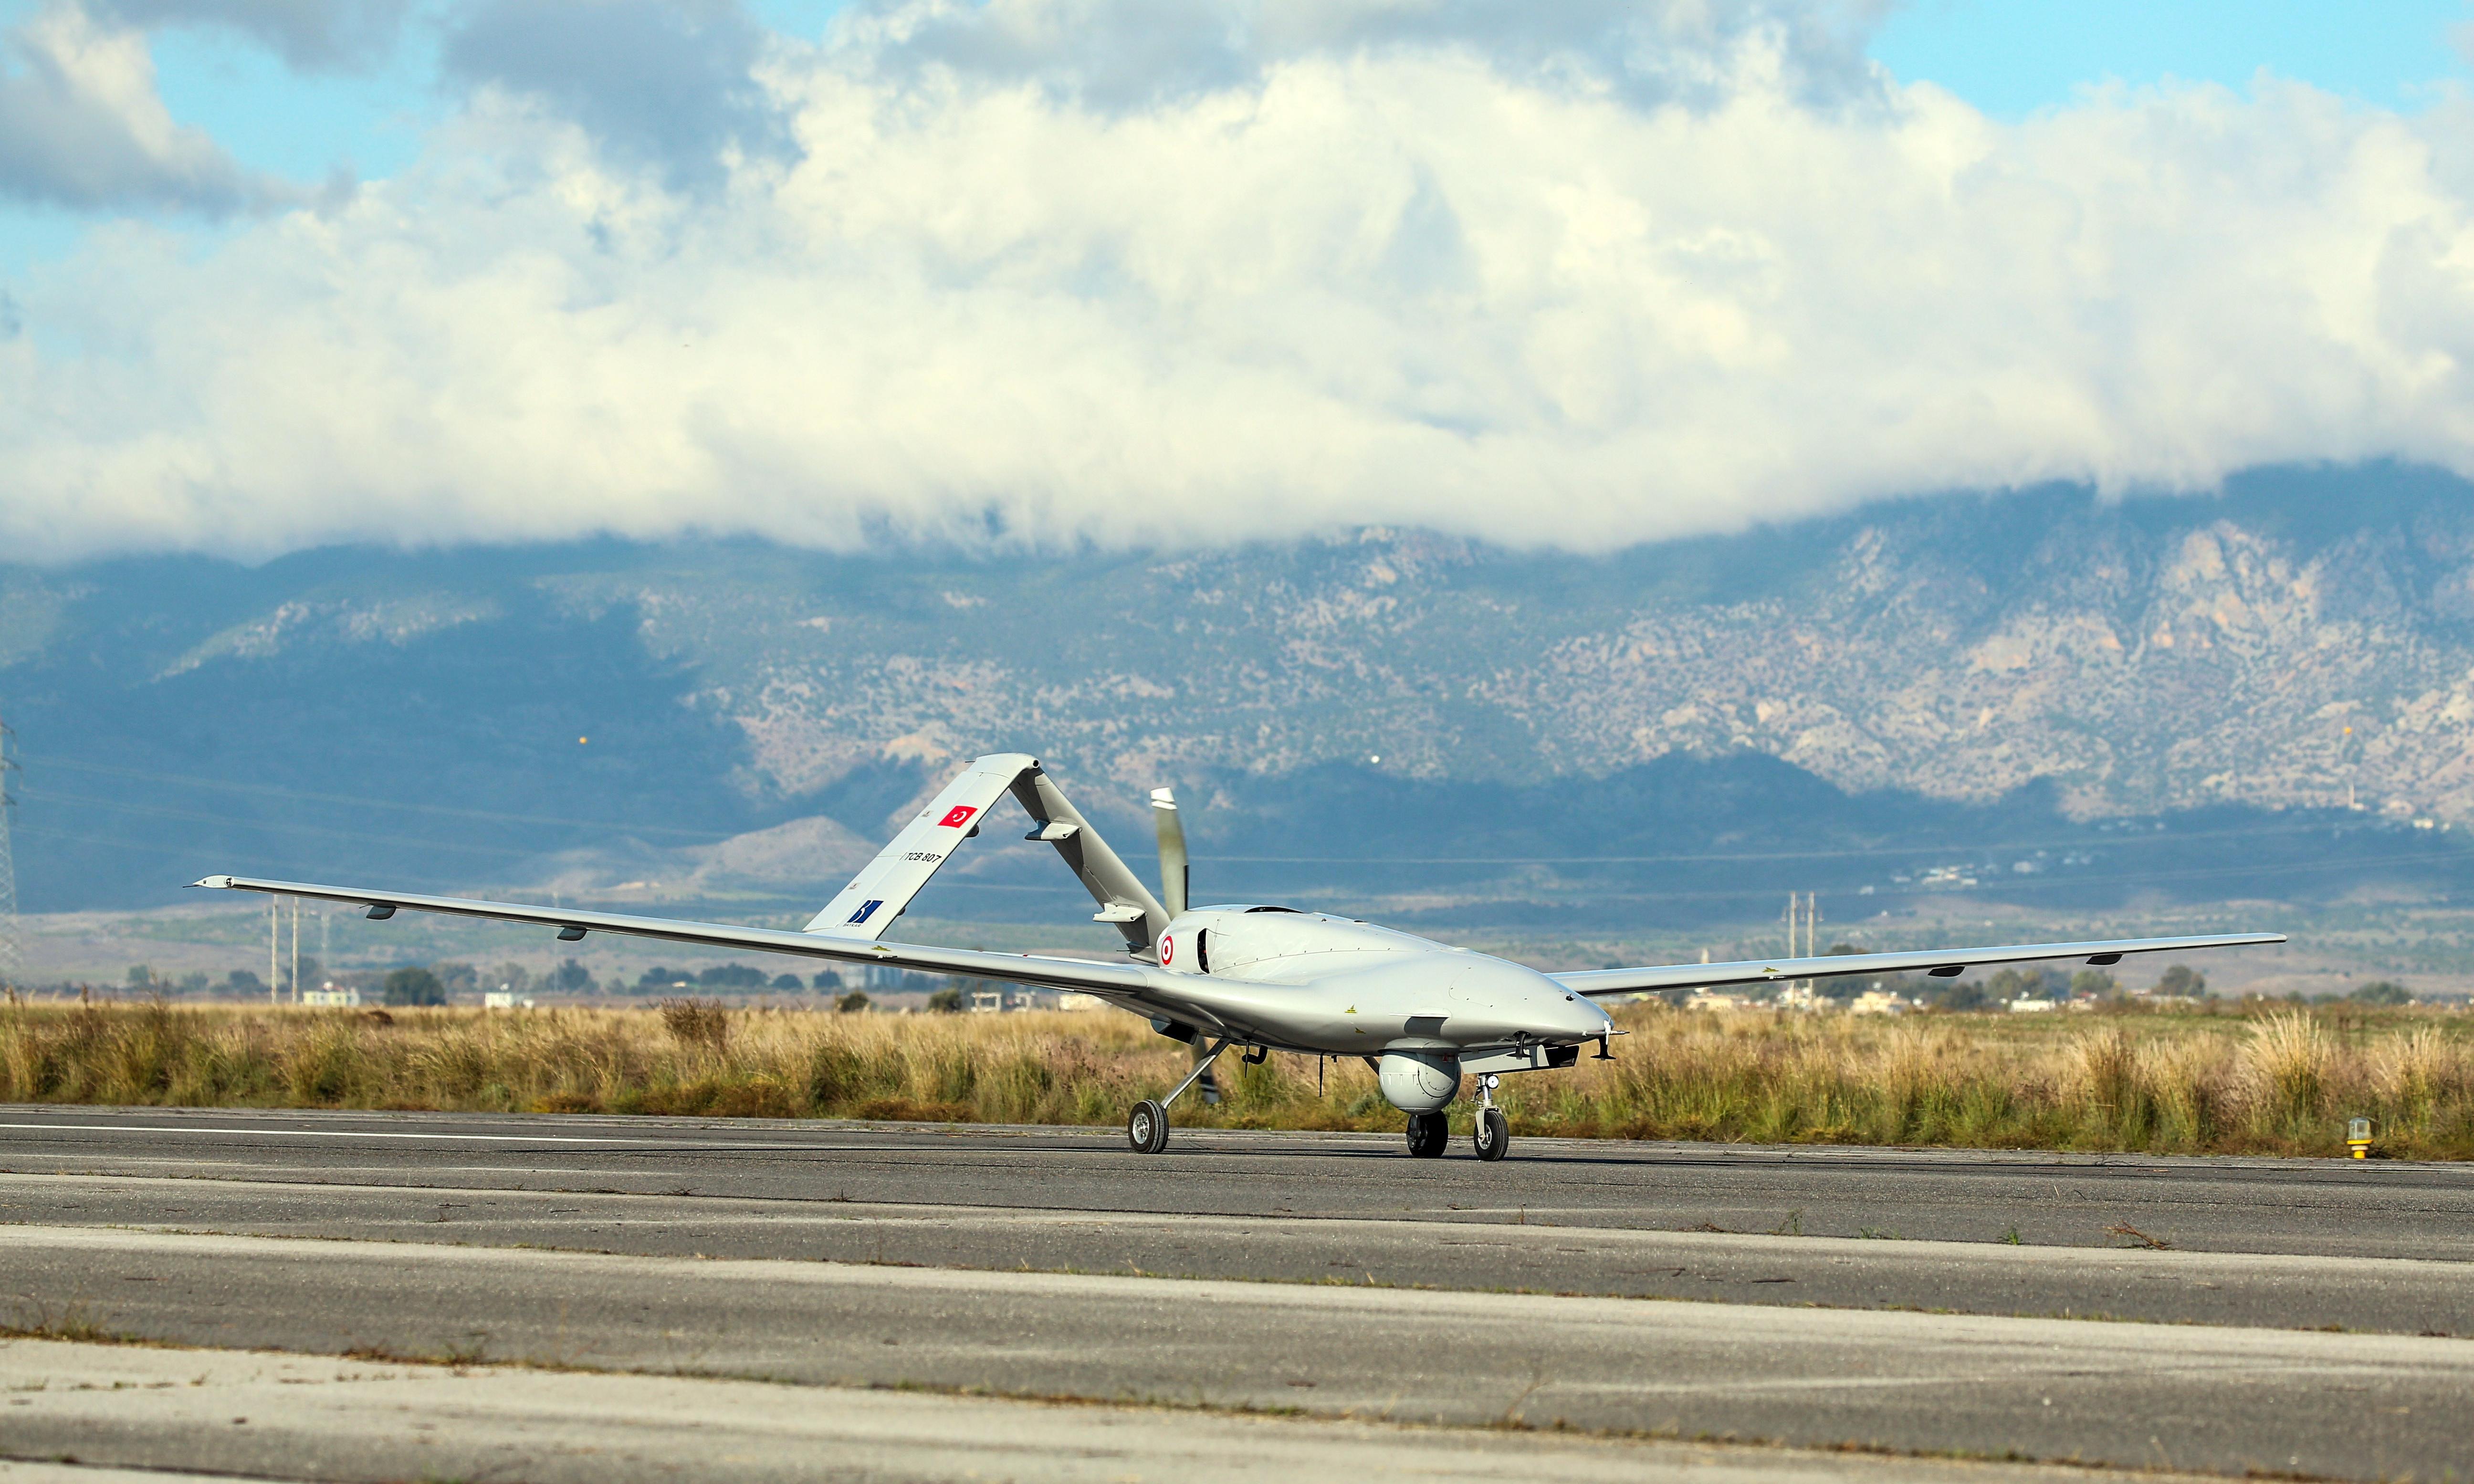 Armed Turkish drone lands in Cyprus as regional tensions rise